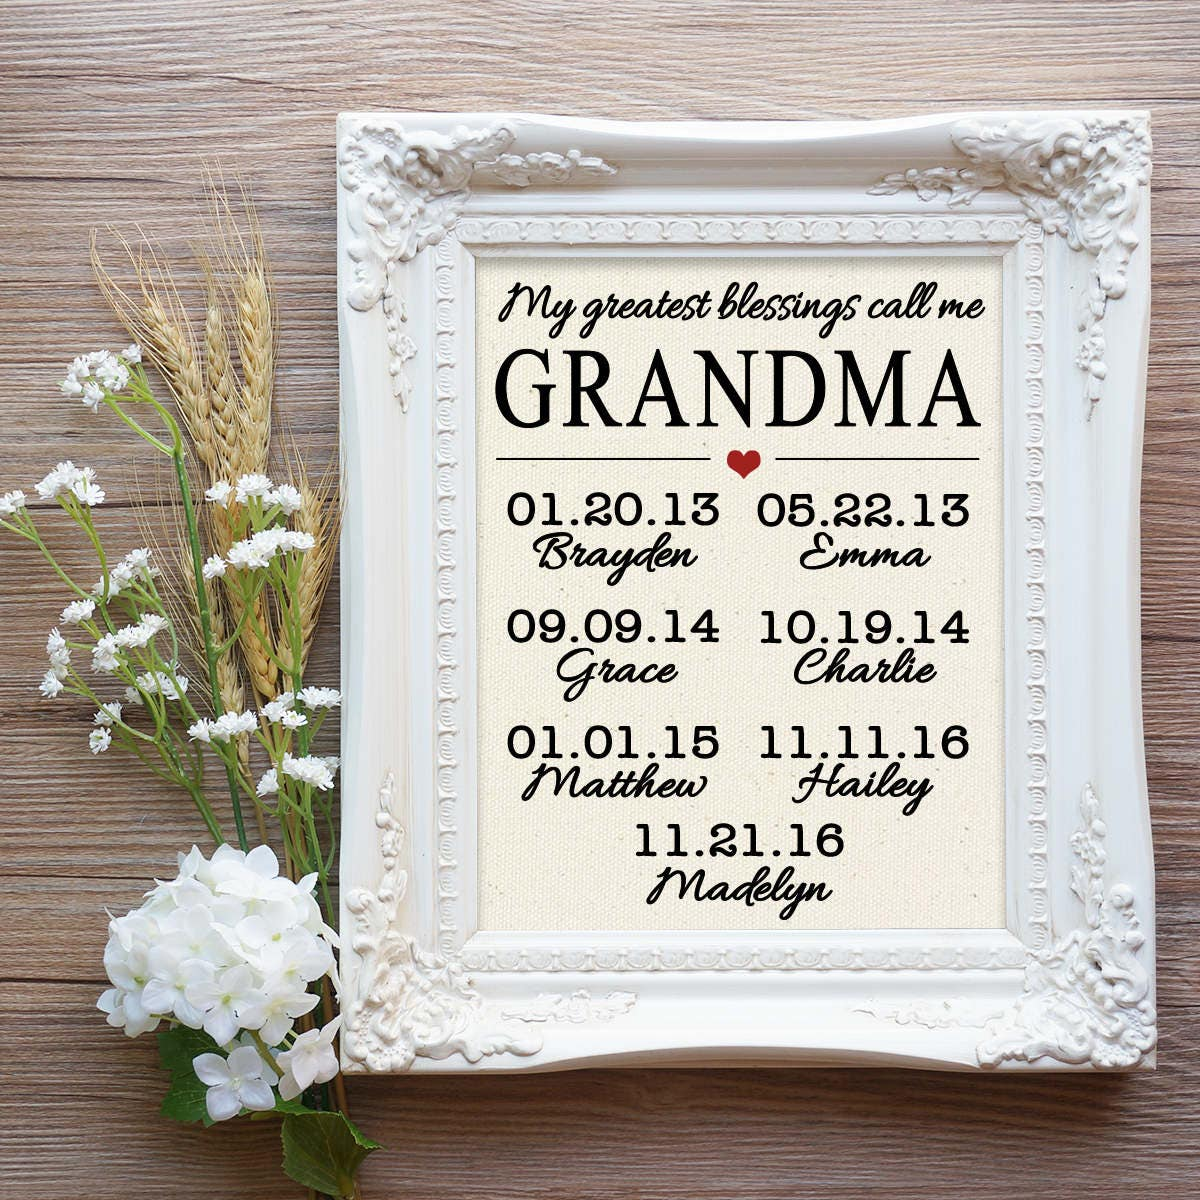 My greatest blessings call me Grandma Grandma Christmas Gift   Etsy